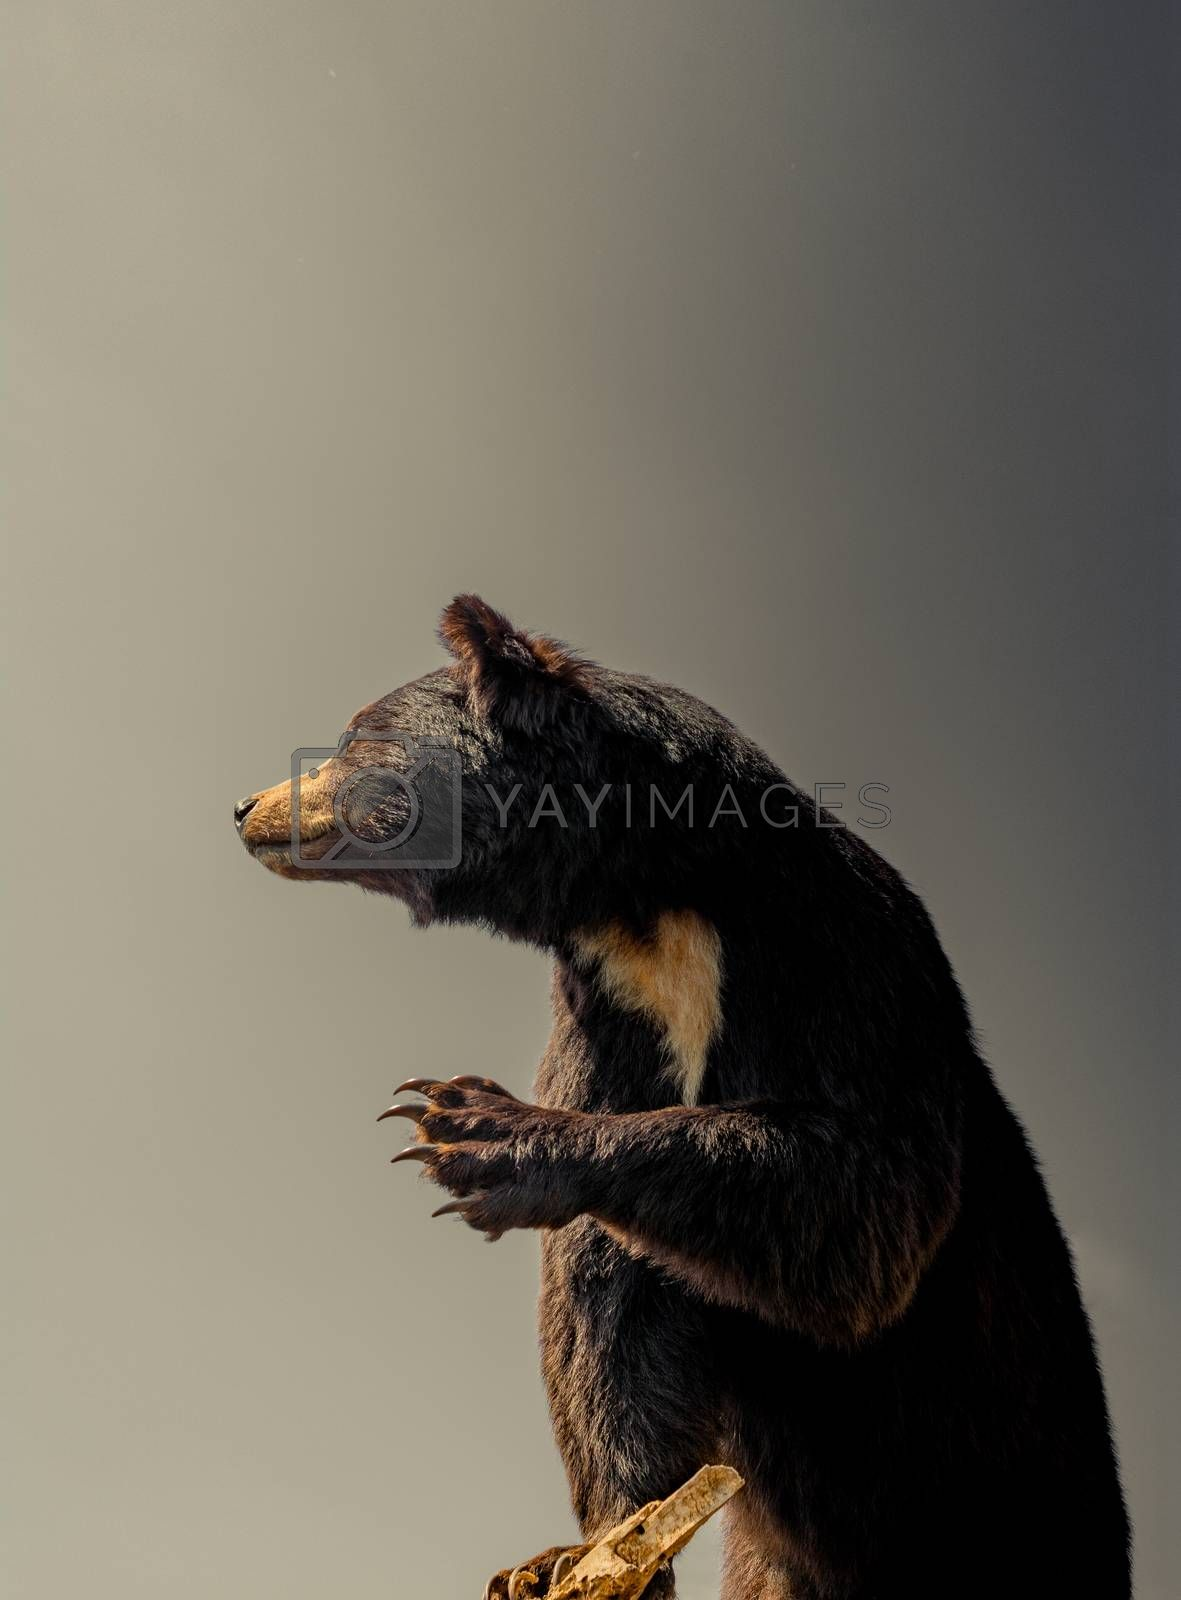 The stuffed big black bear as wild animal in the view